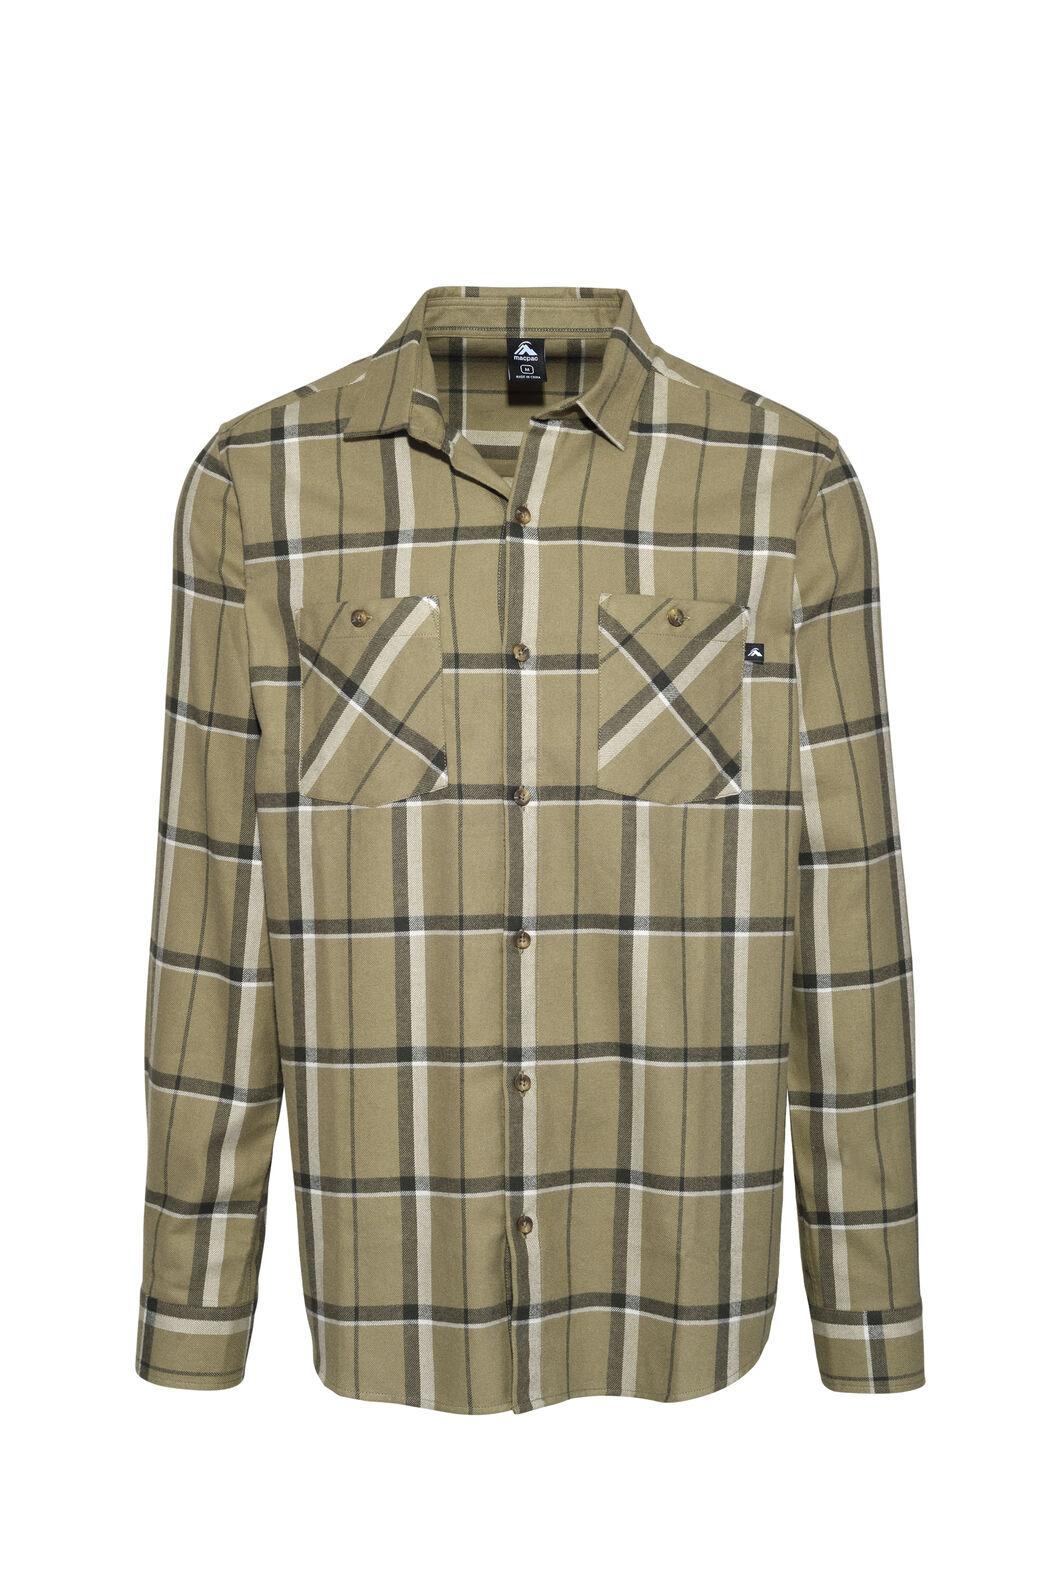 Macpac Porters Flannel Shirt — Men's, Covert Green/Moonbeam, hi-res